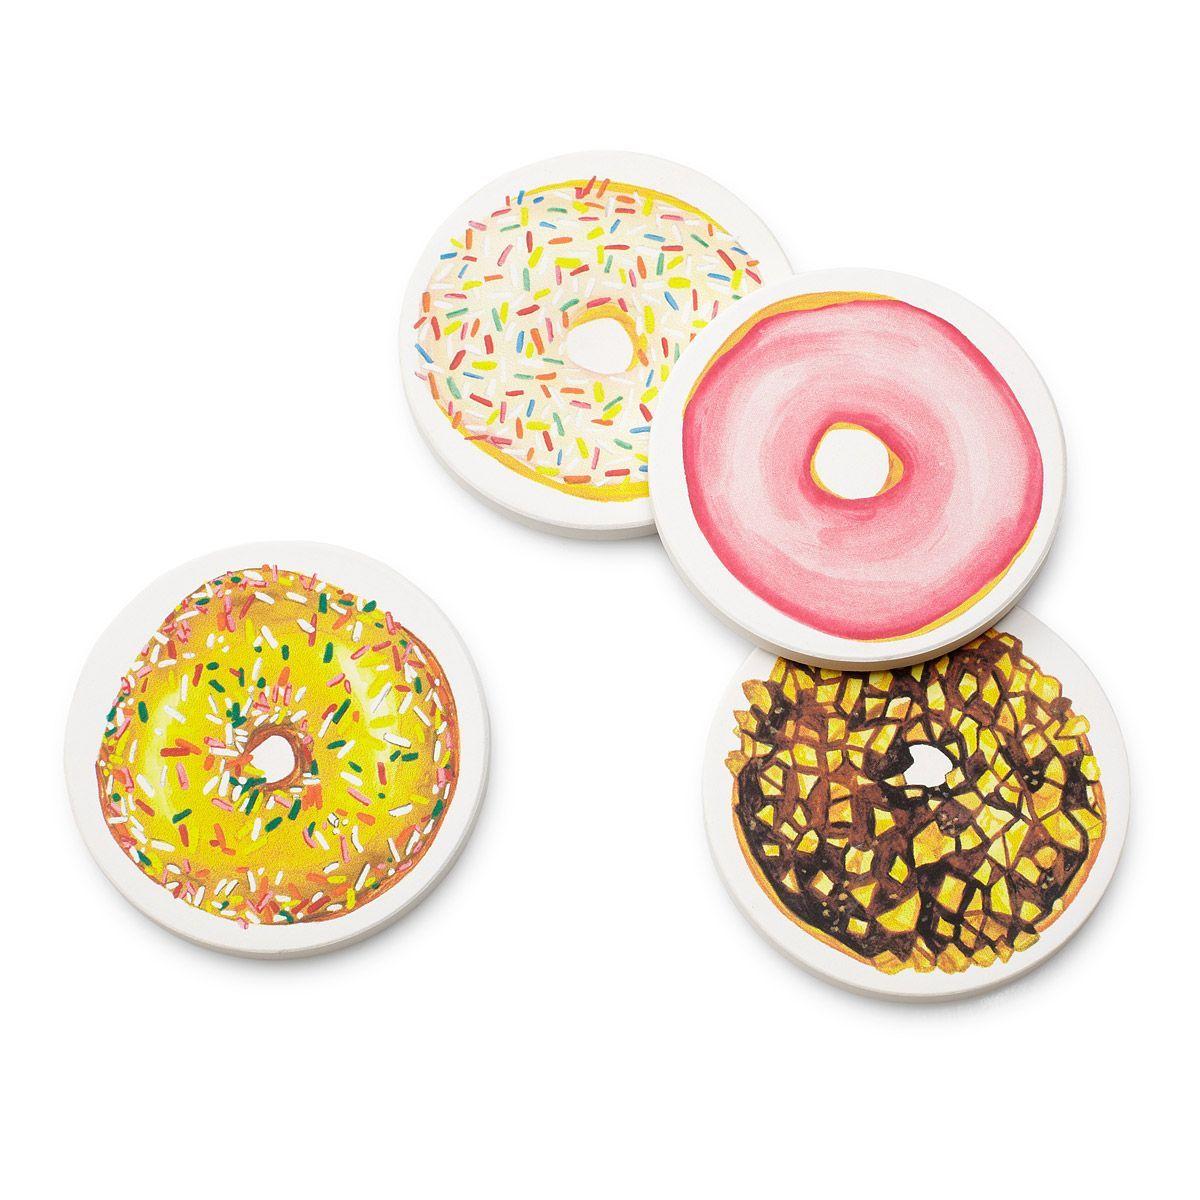 Donut coasters drink coaster ceramic drink coasters